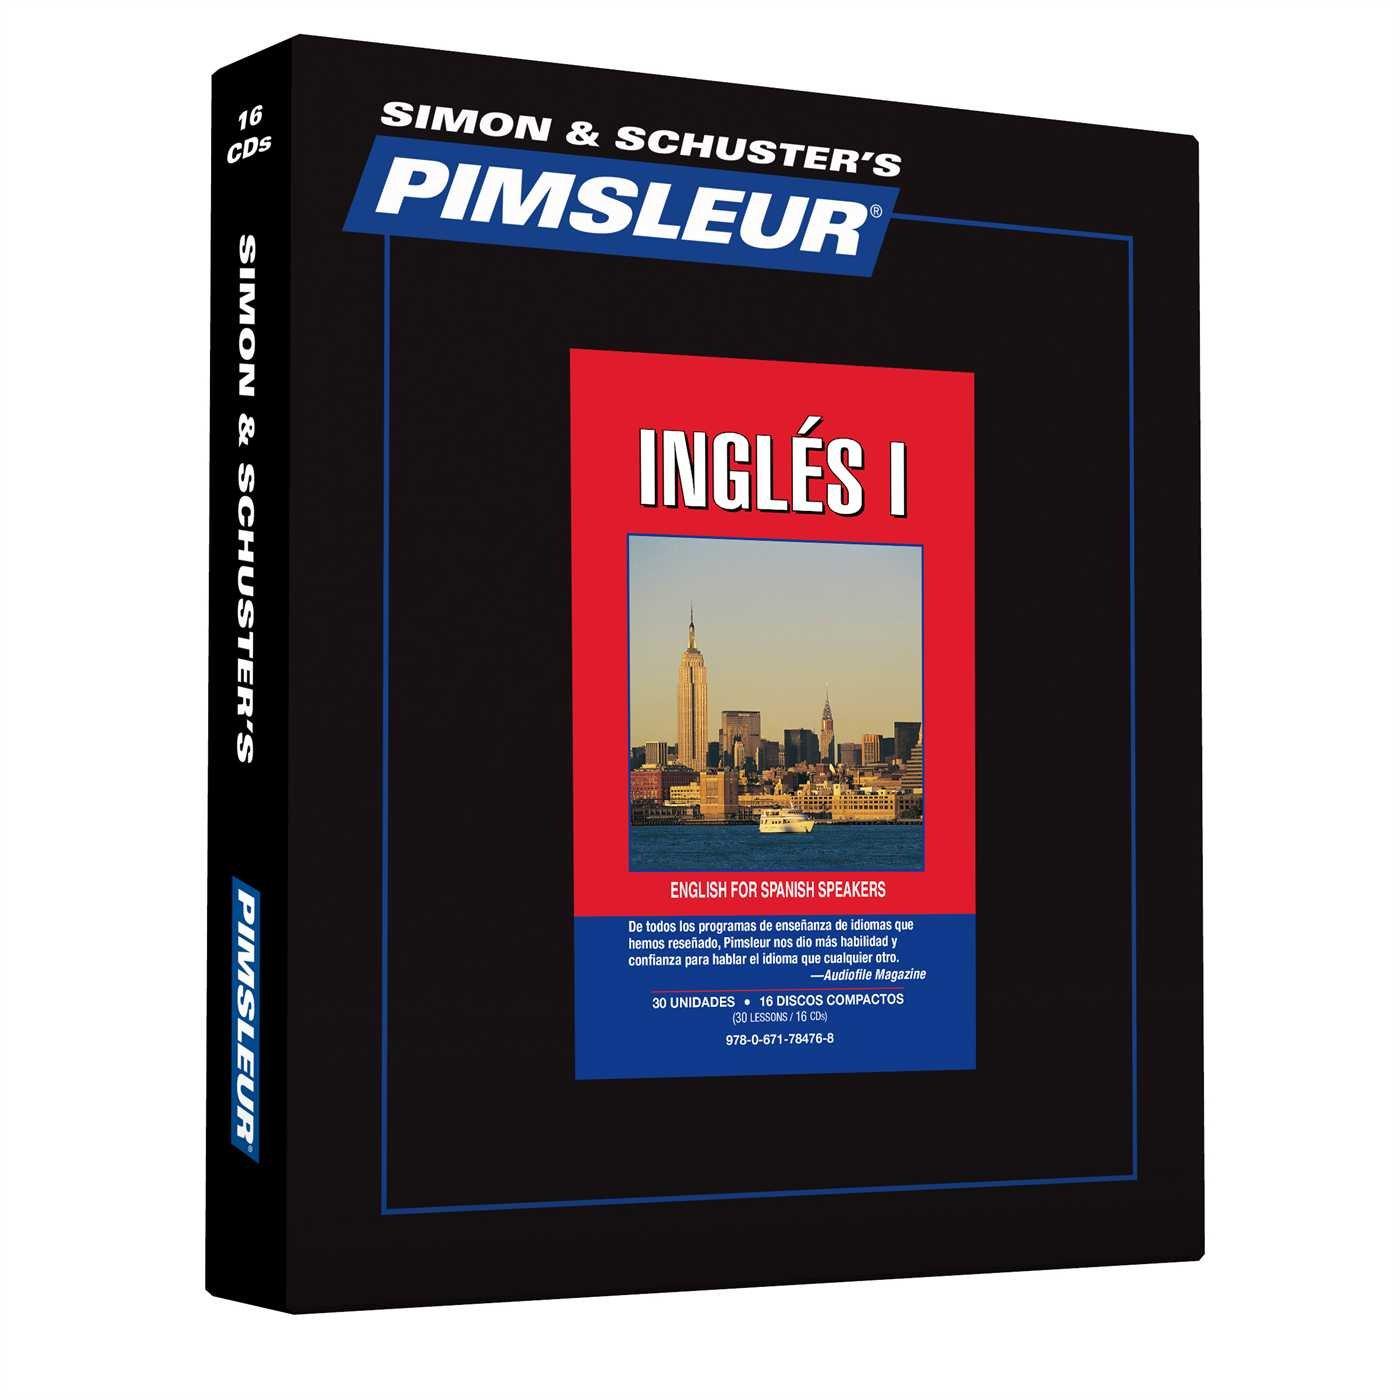 English for Spanish Speakers 1: Pimsleur: 9780671784768: Amazon.com: Books